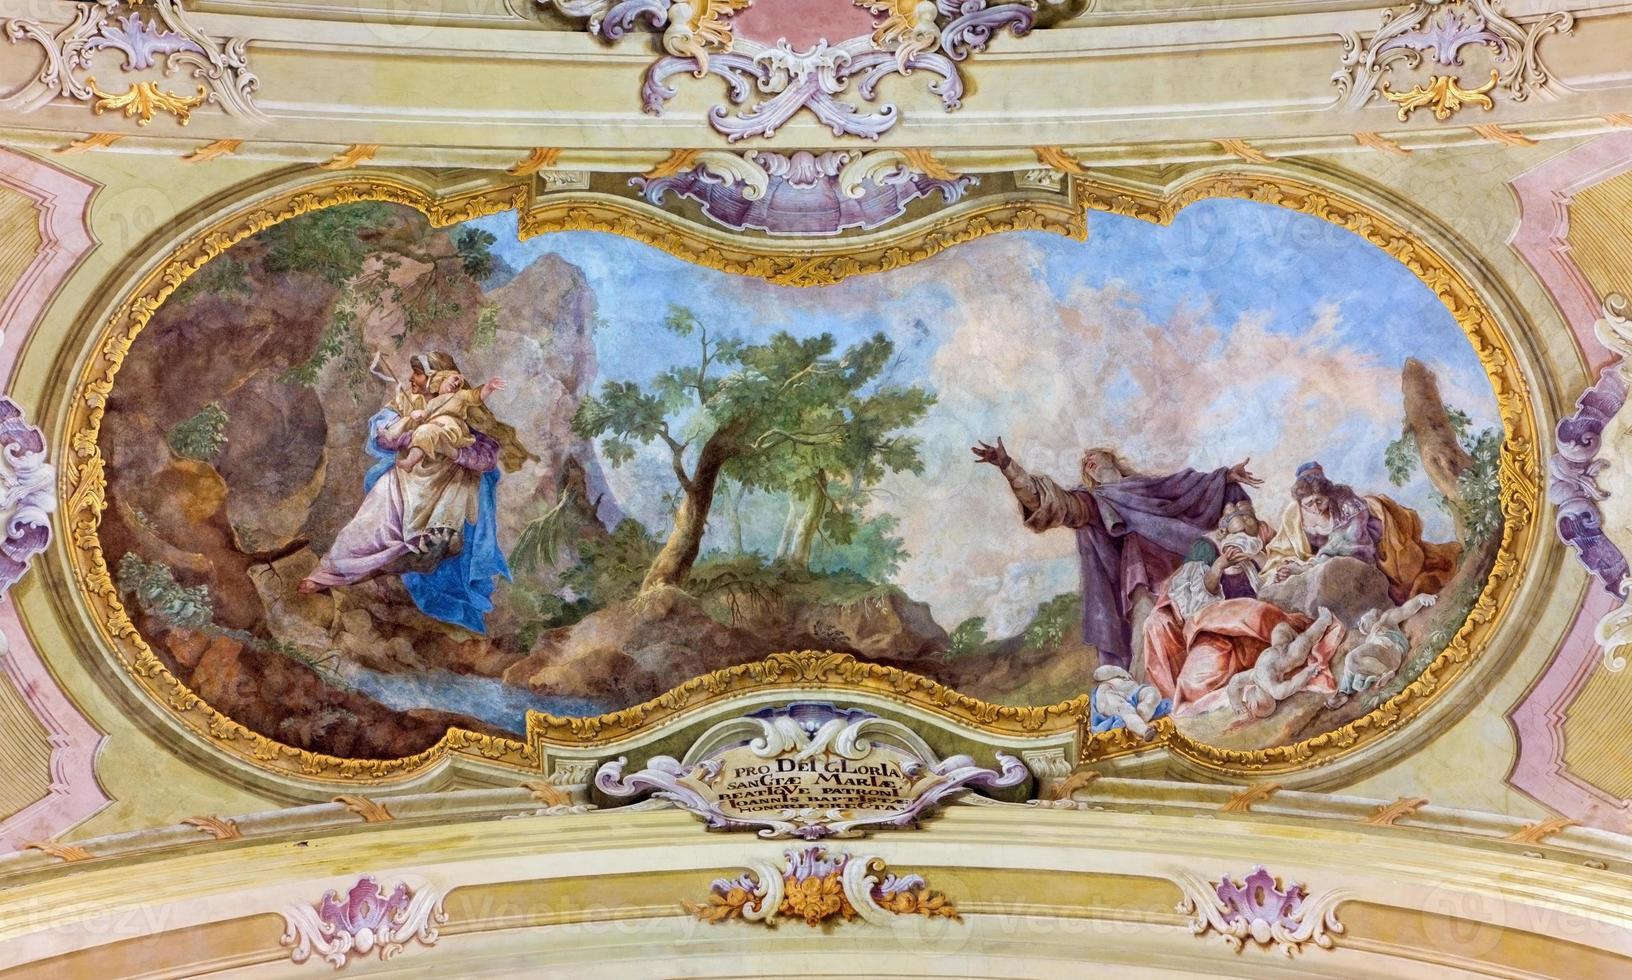 jasov - fresco op barok plafond van klooster foto